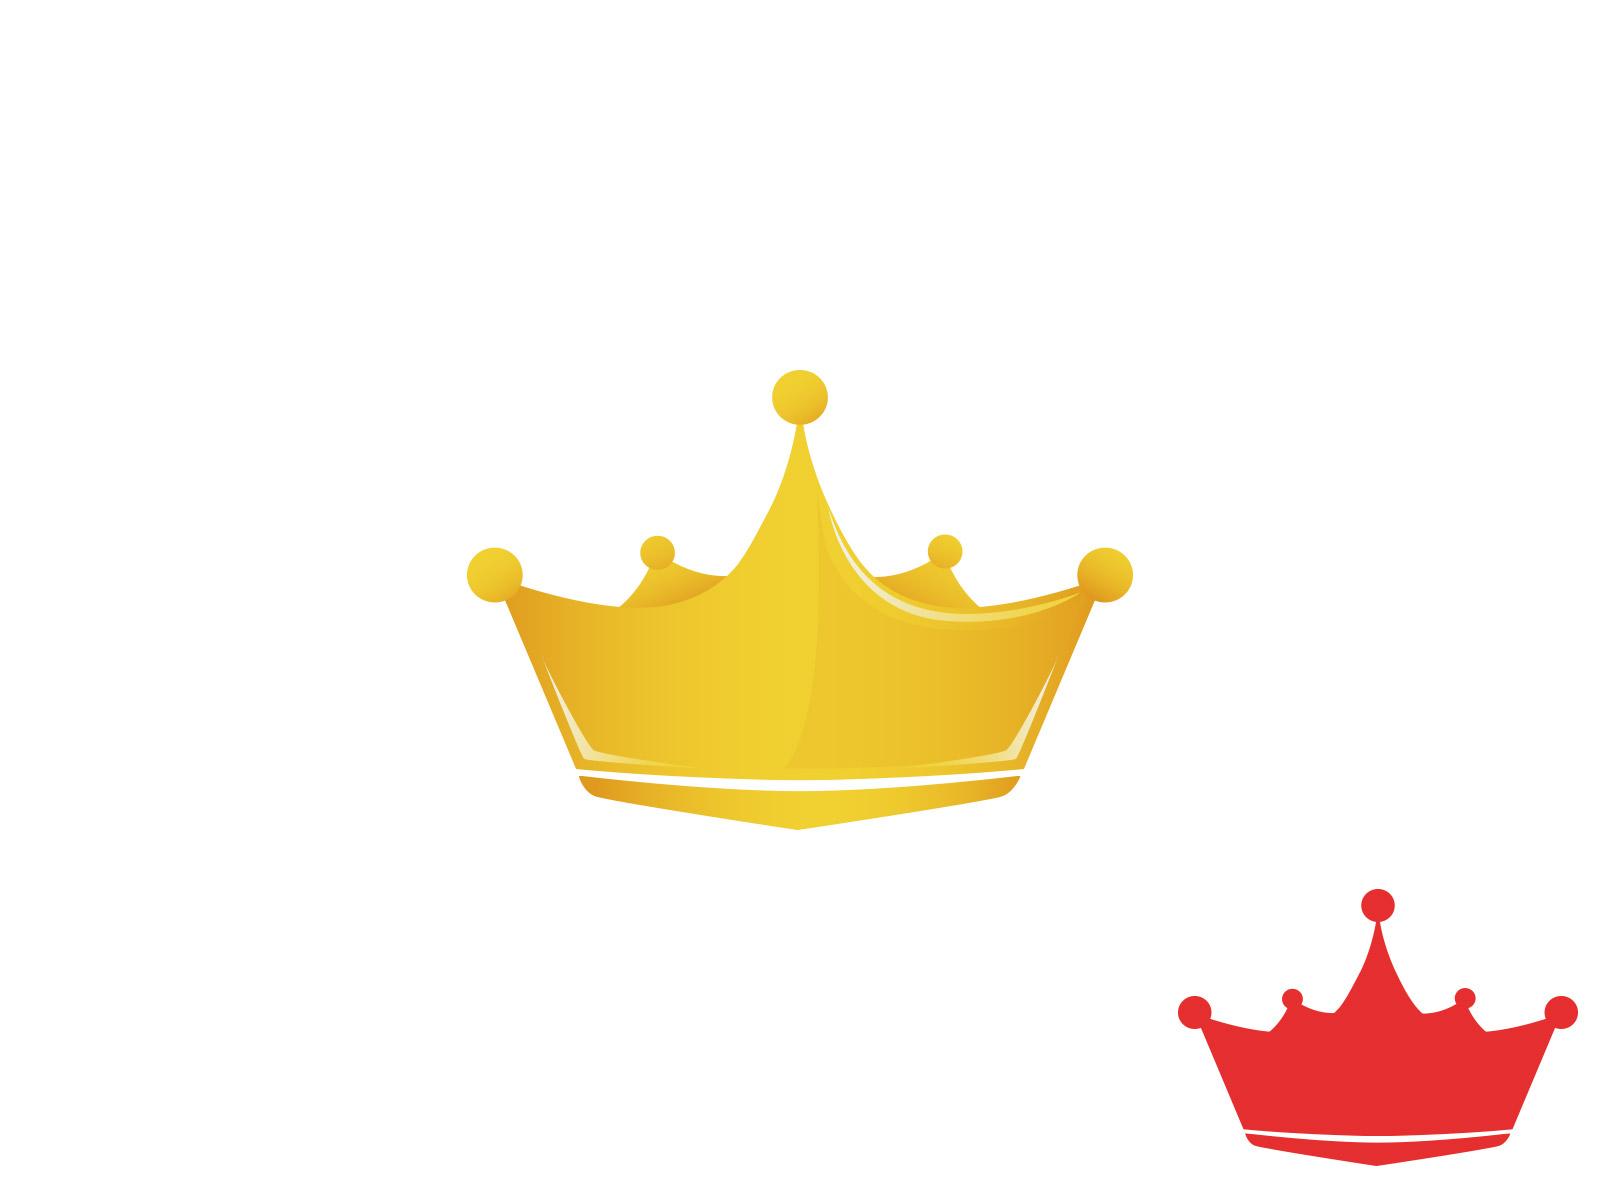 Logo Design by olii - Entry No. 132 in the Logo Design Contest Fun Logo Design for MarQueen Animal Clinic.